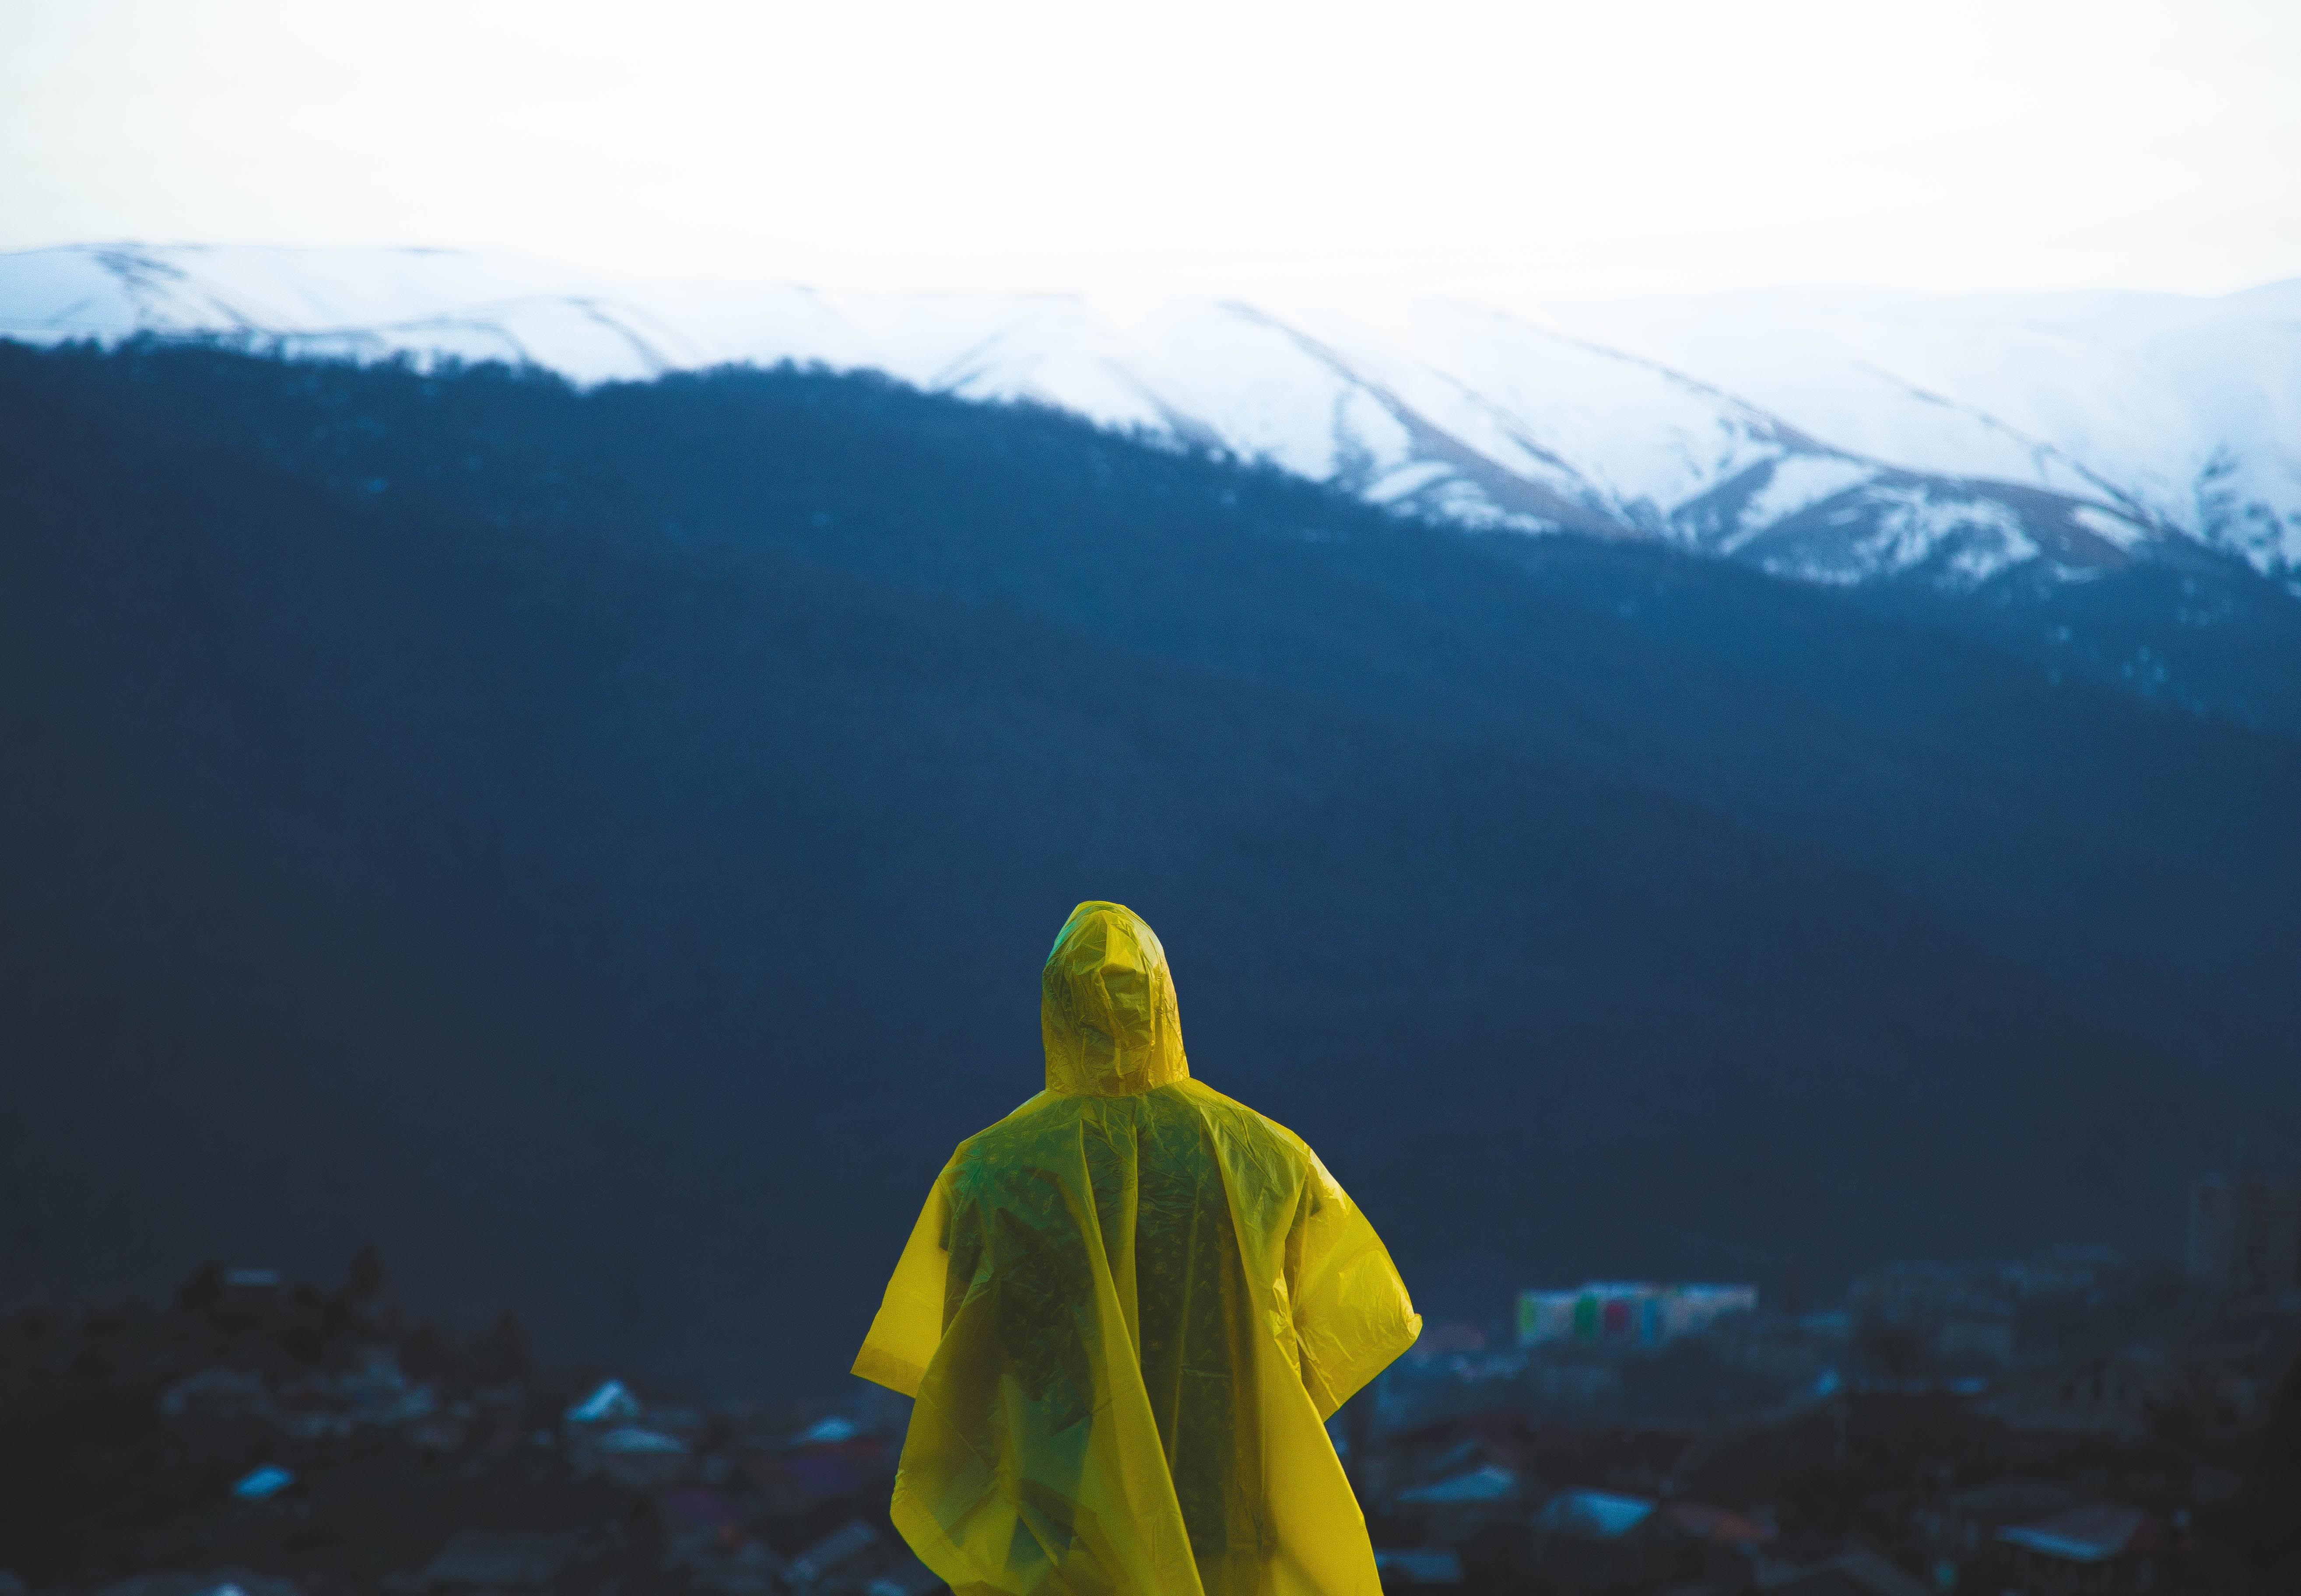 man wearing yellow rain coat